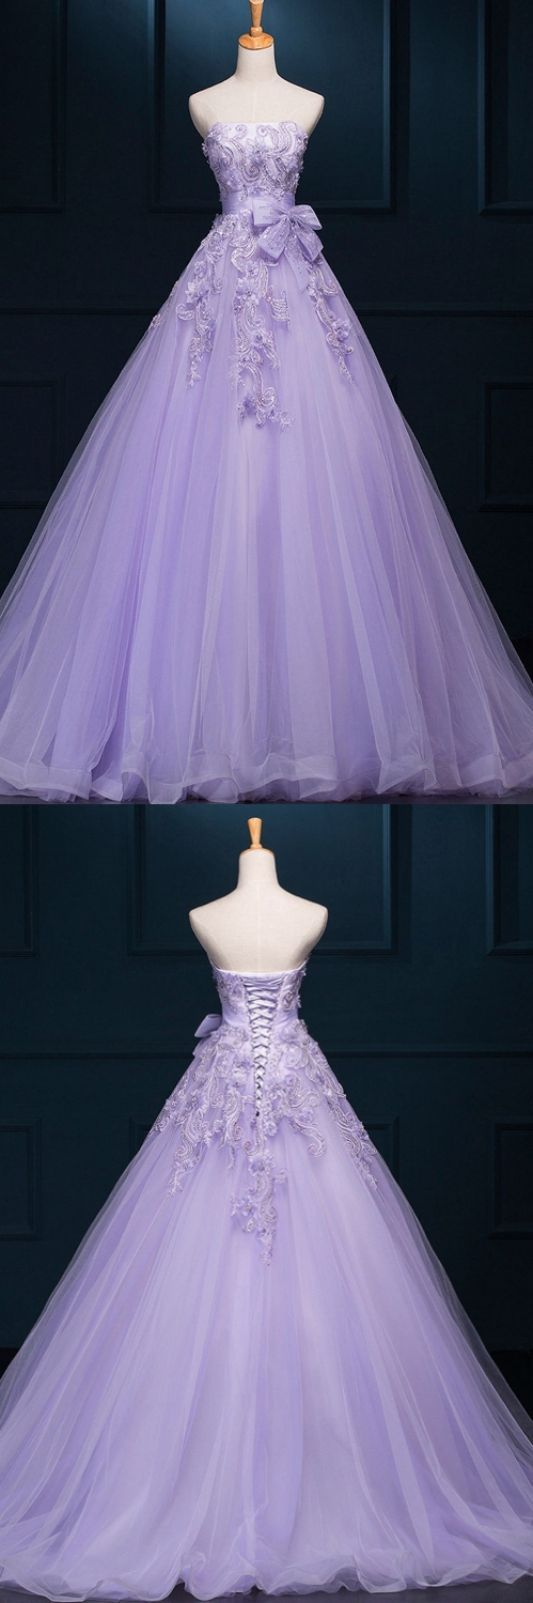 Outlet purple wedding dresses long wedding dresses long purple